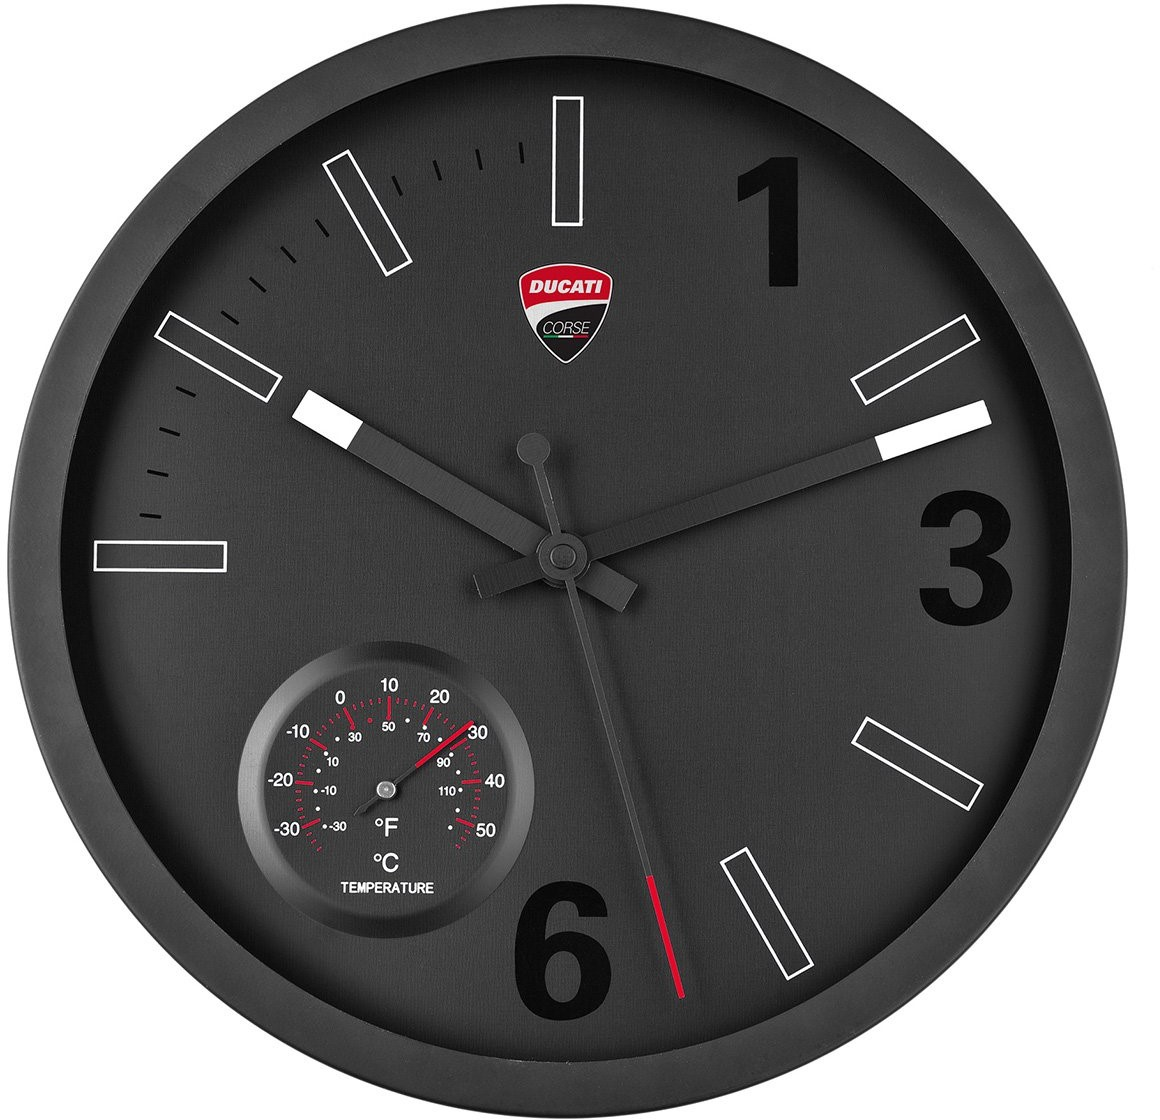 【DUCATI performance】Ducati Corse 掛牆時鐘(含溫度計) - 「Webike-摩托百貨」